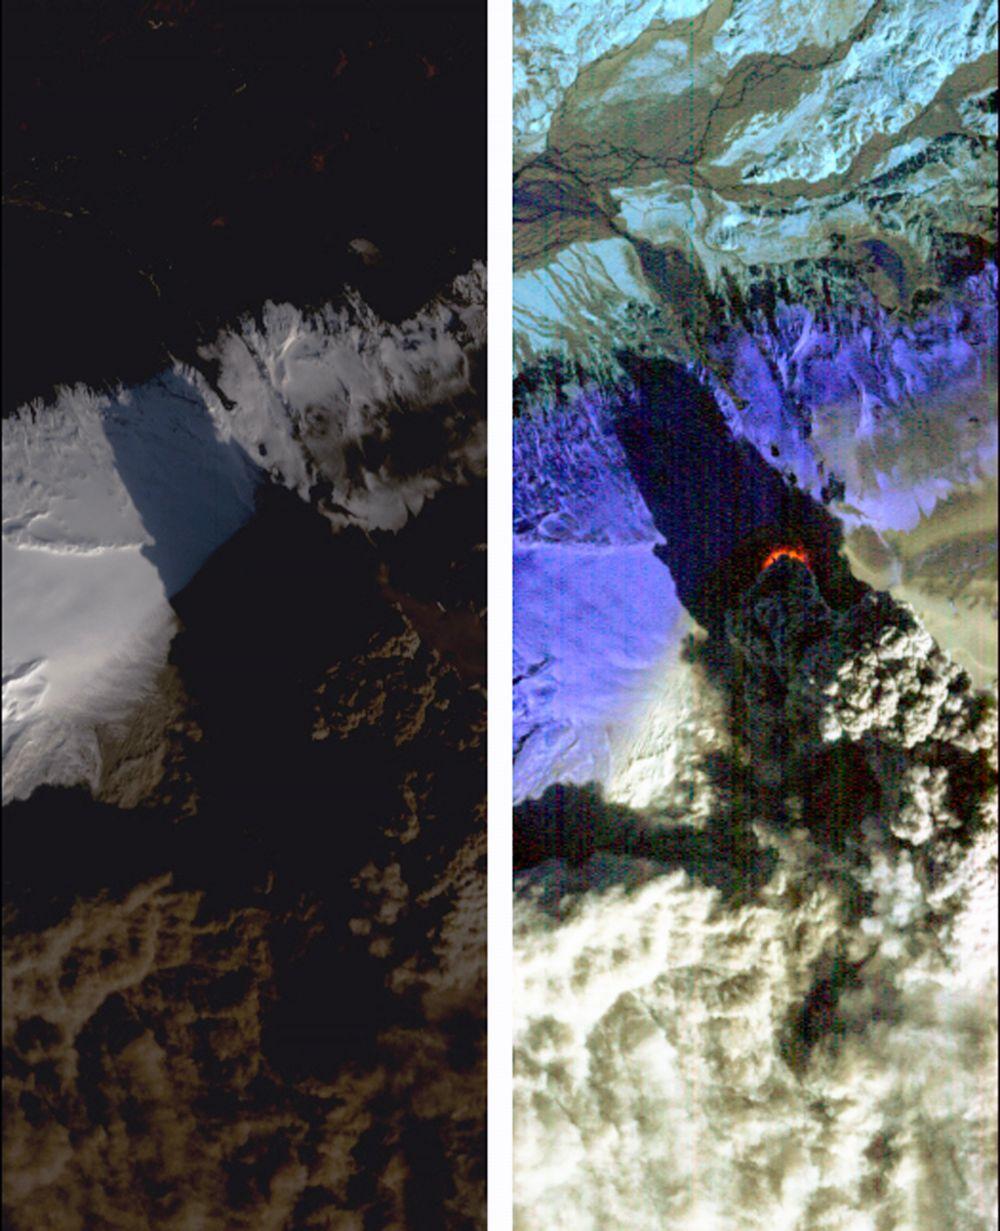 Снимок из космоса.